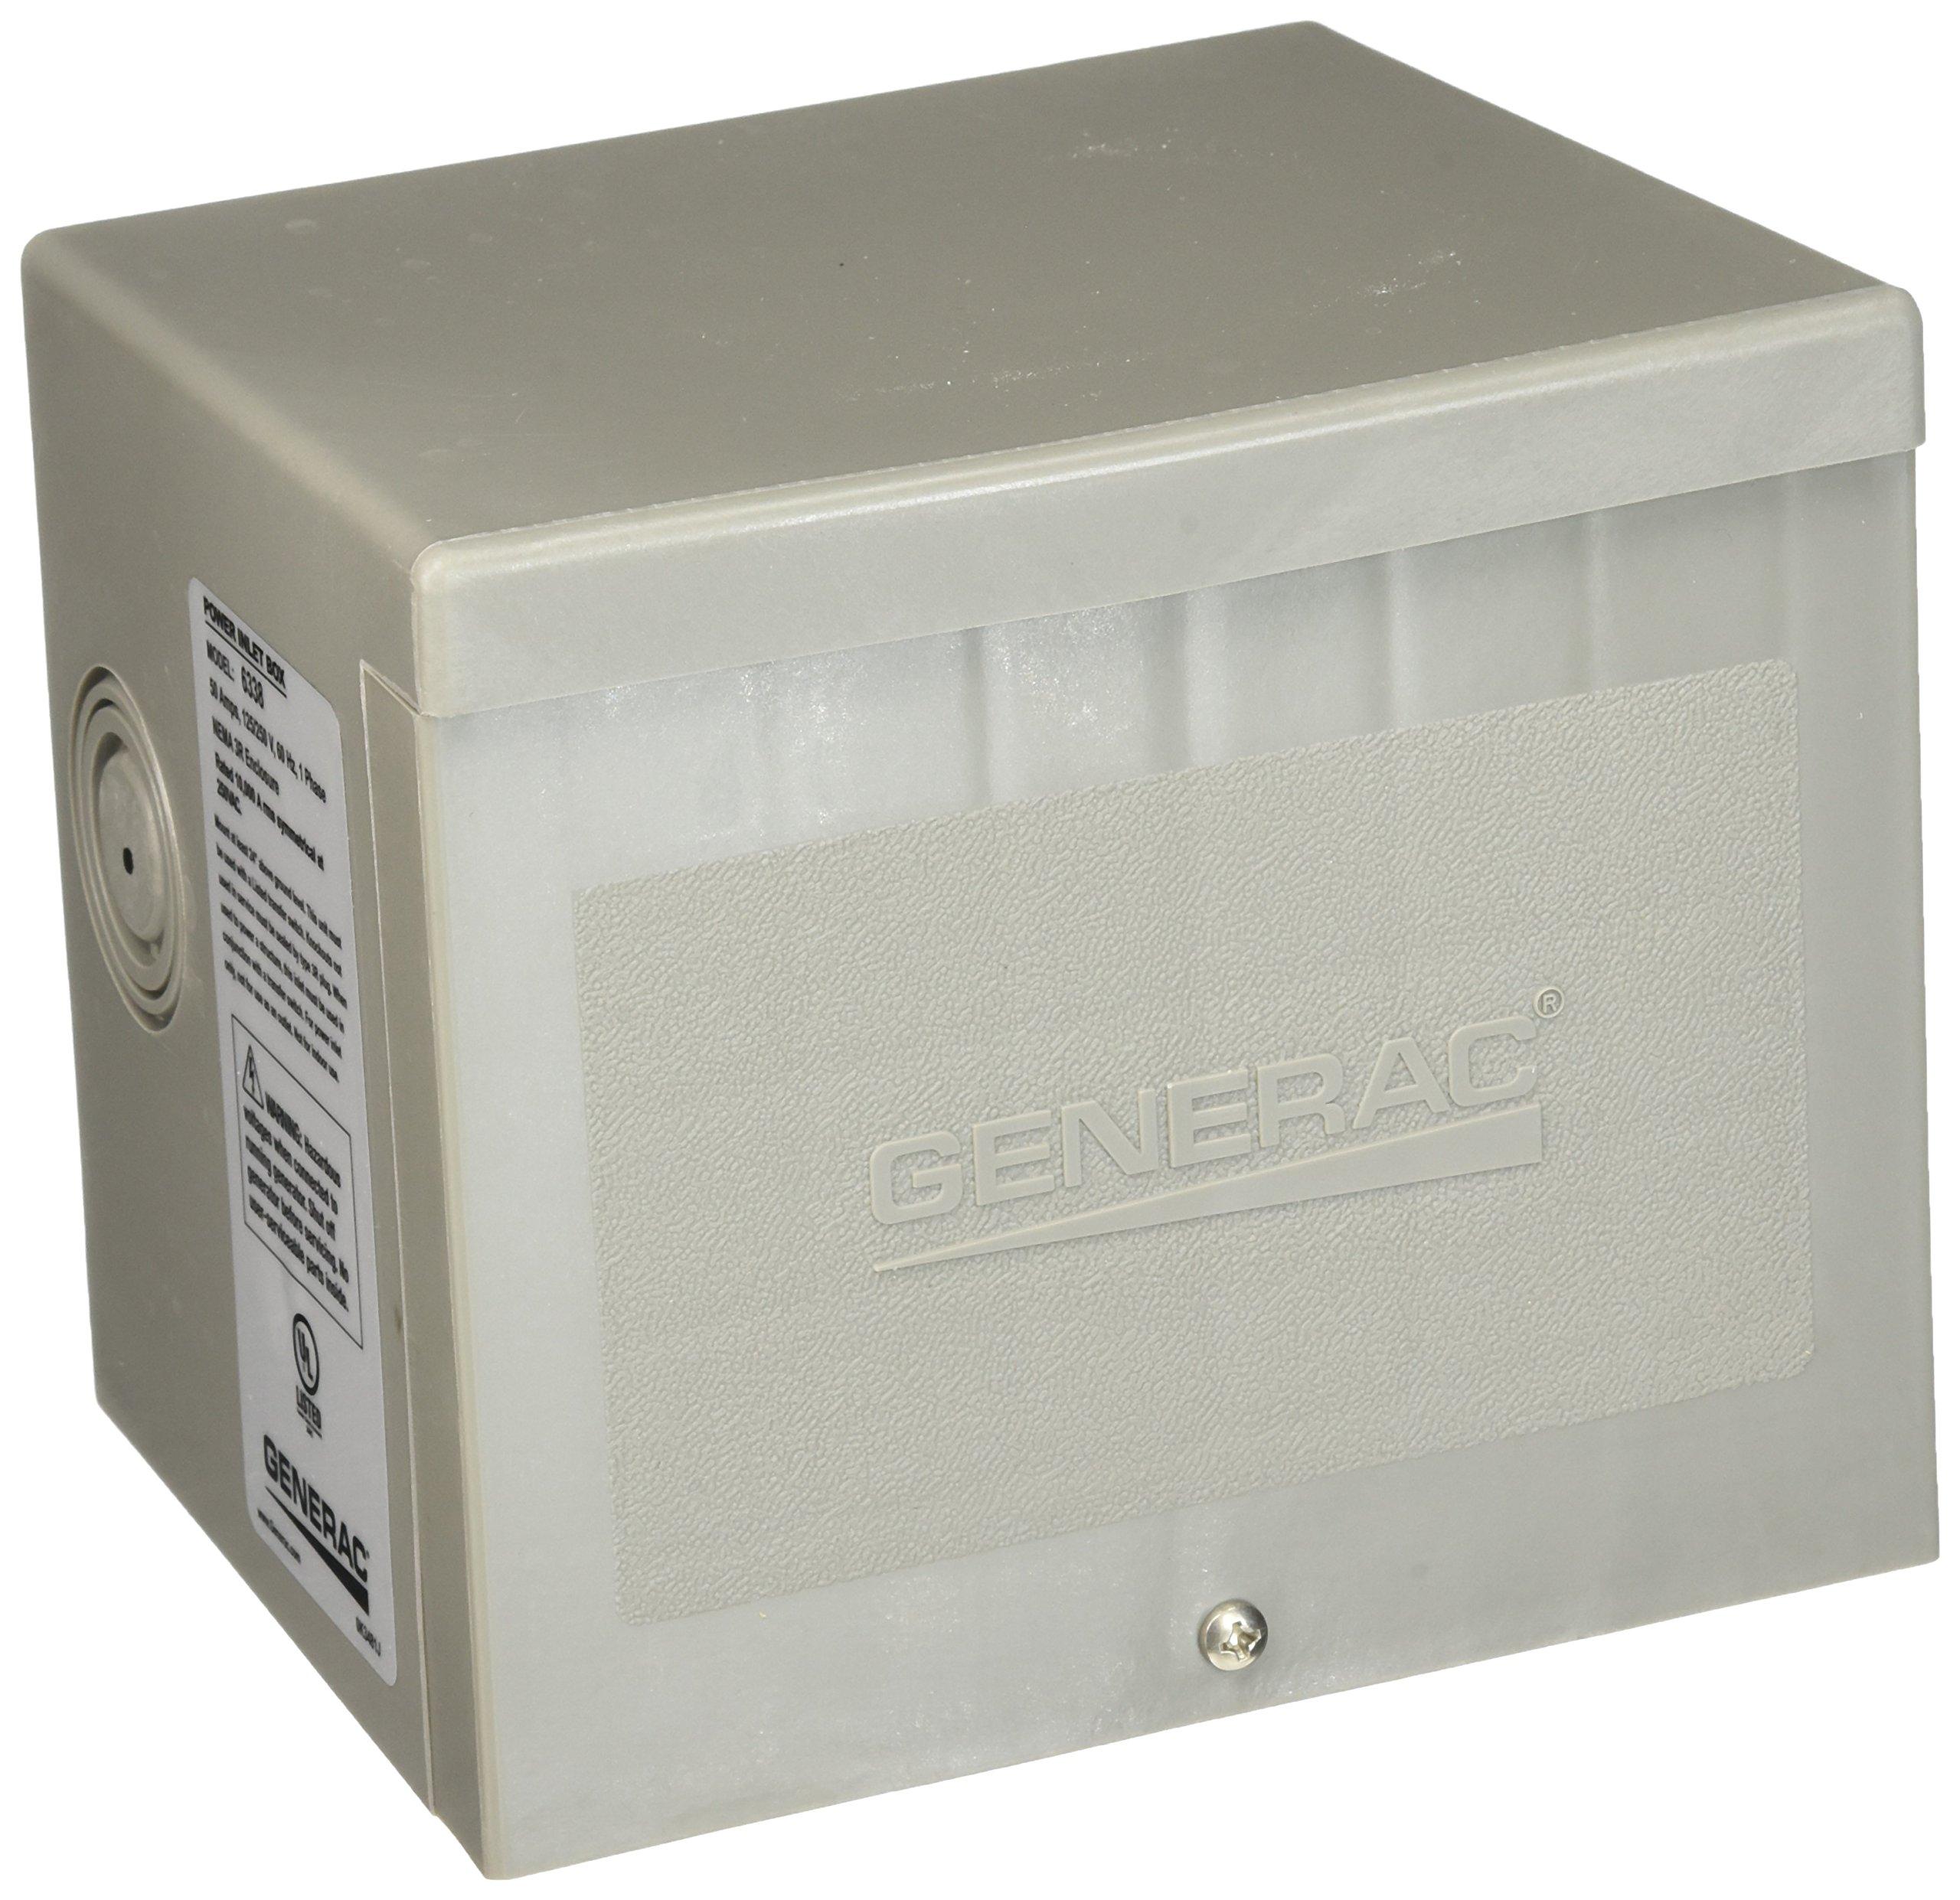 Generac 6338 50-Amp 4-Wire 125/250V Raintight Non-Metallic Power Inlet Box by Generac